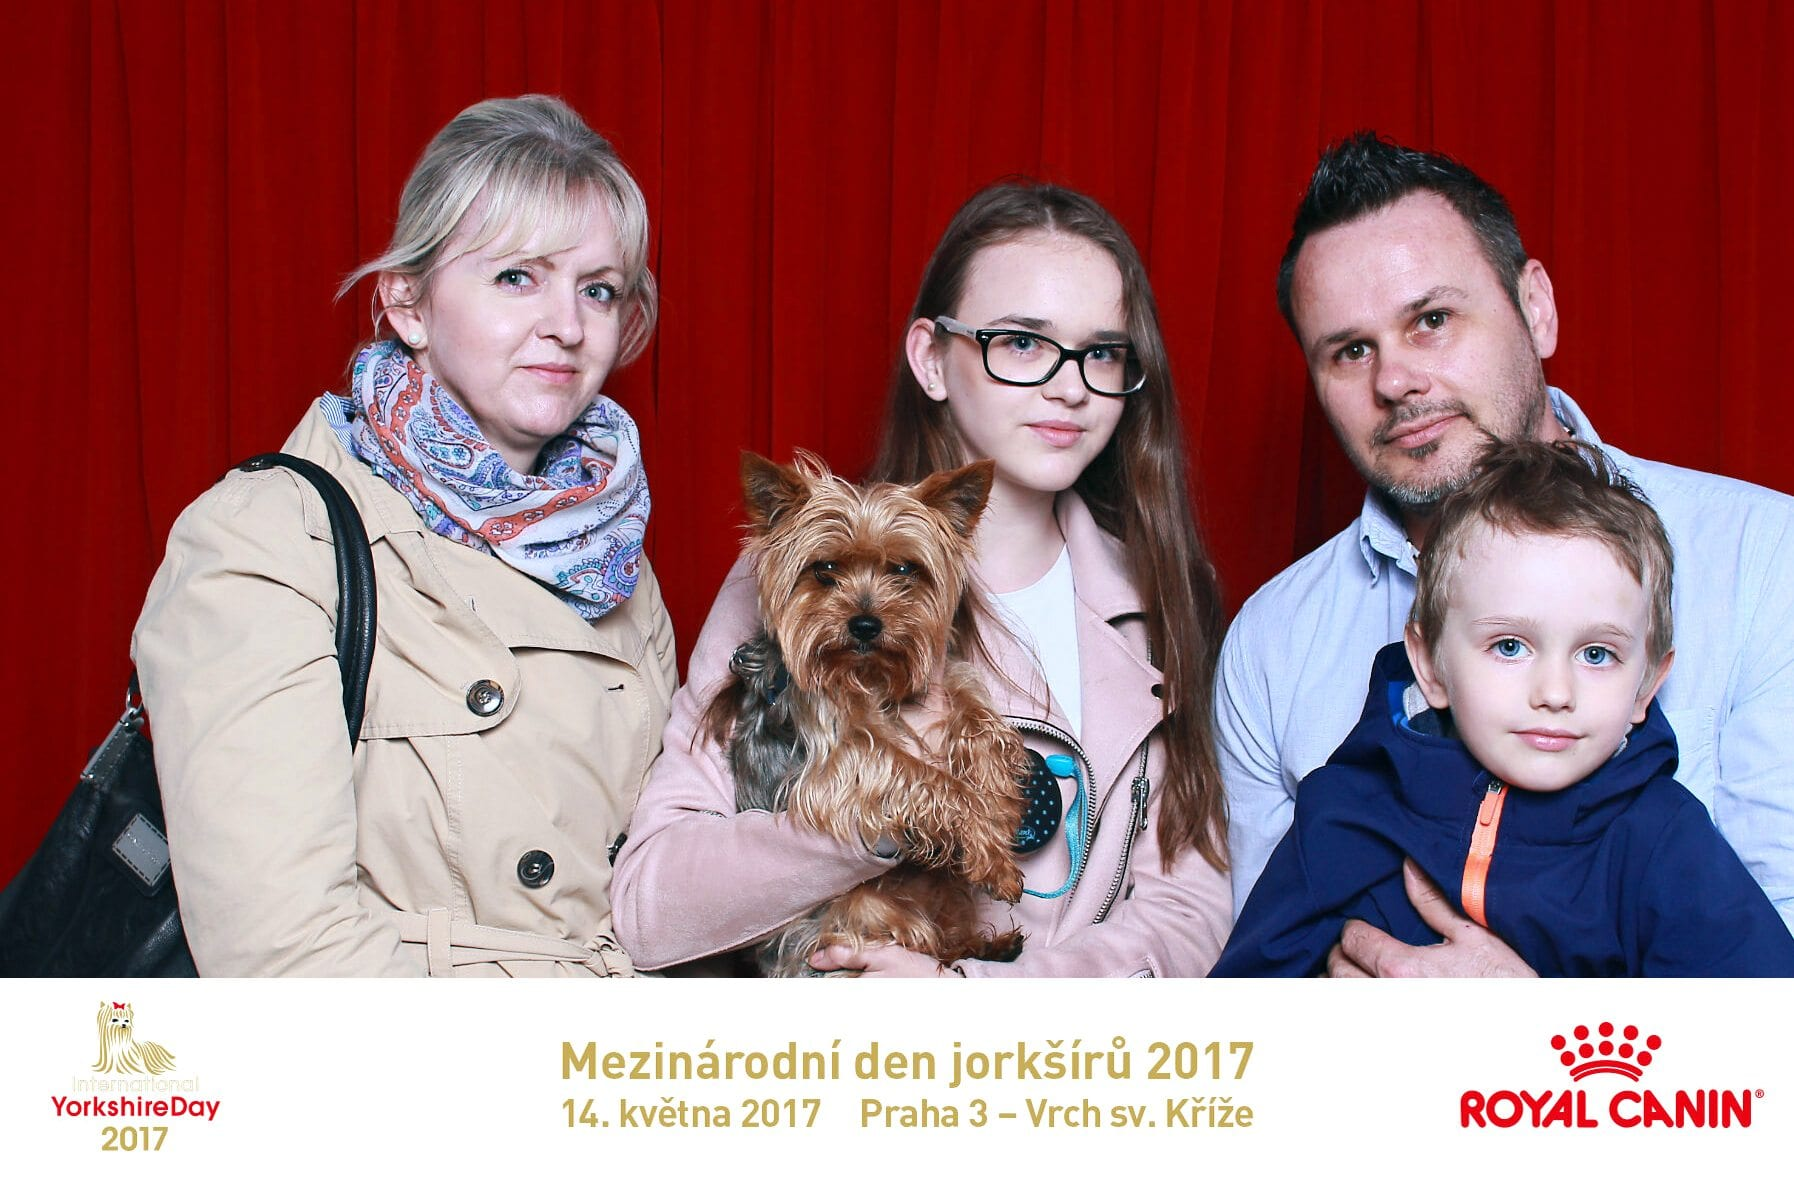 fotokoutek-royal-canin-14-5-2017-246863